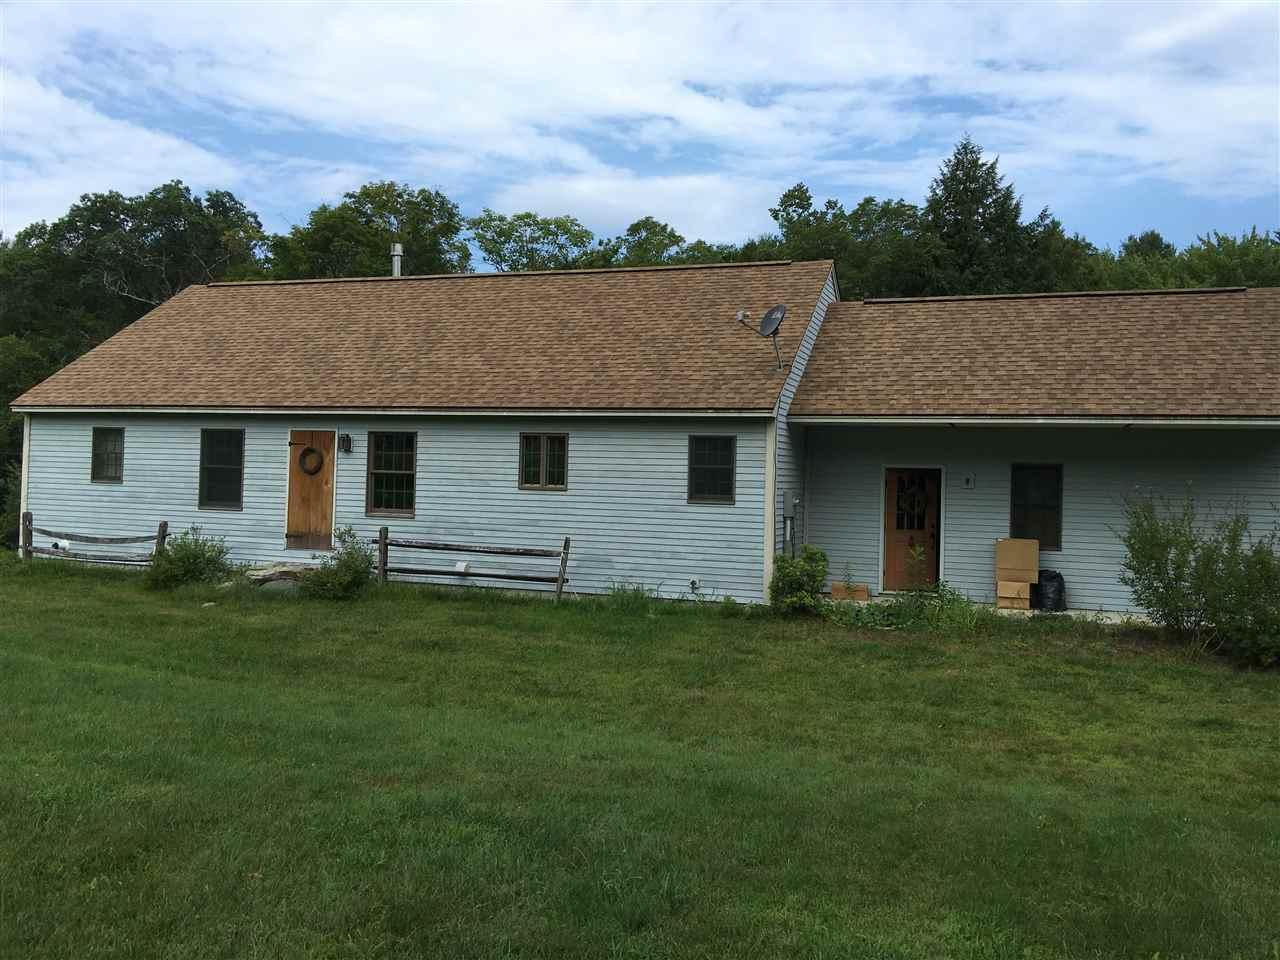 410 Carley Road Road, Springfield, VT 05156